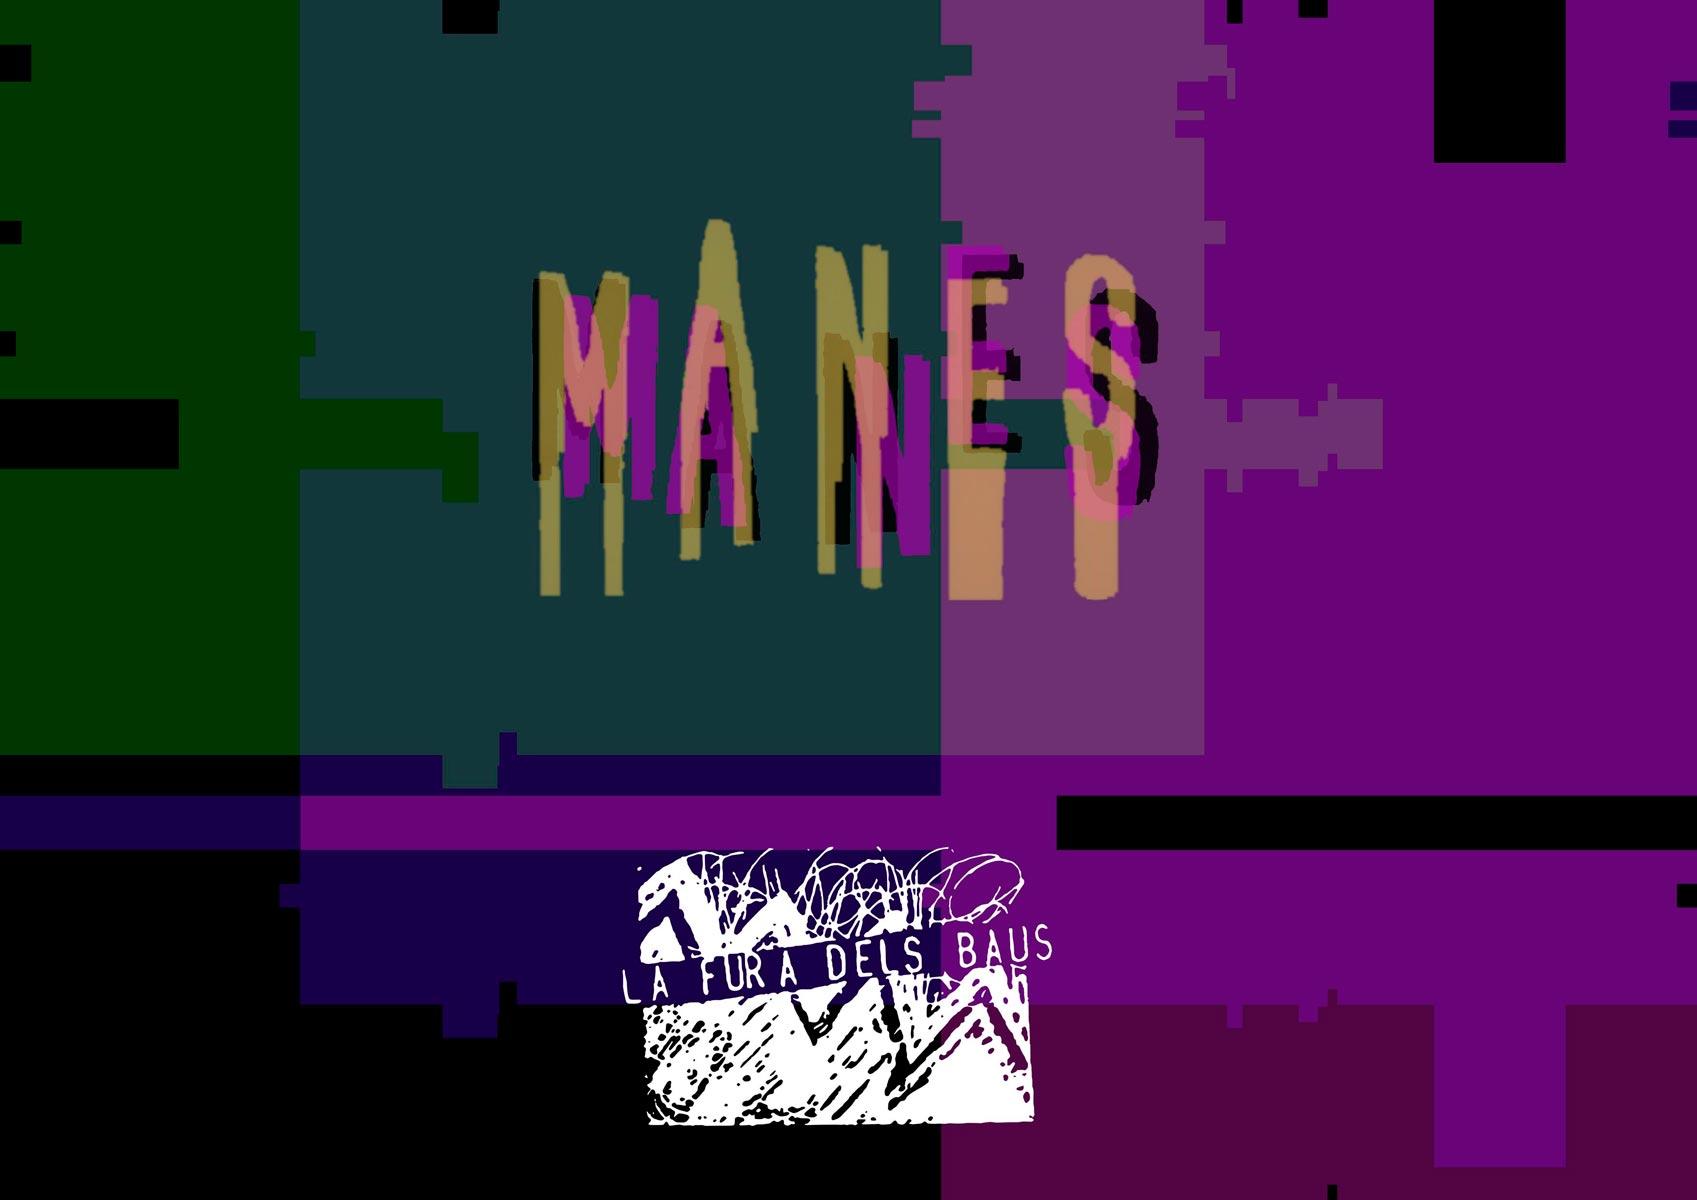 Manes - CARTEL